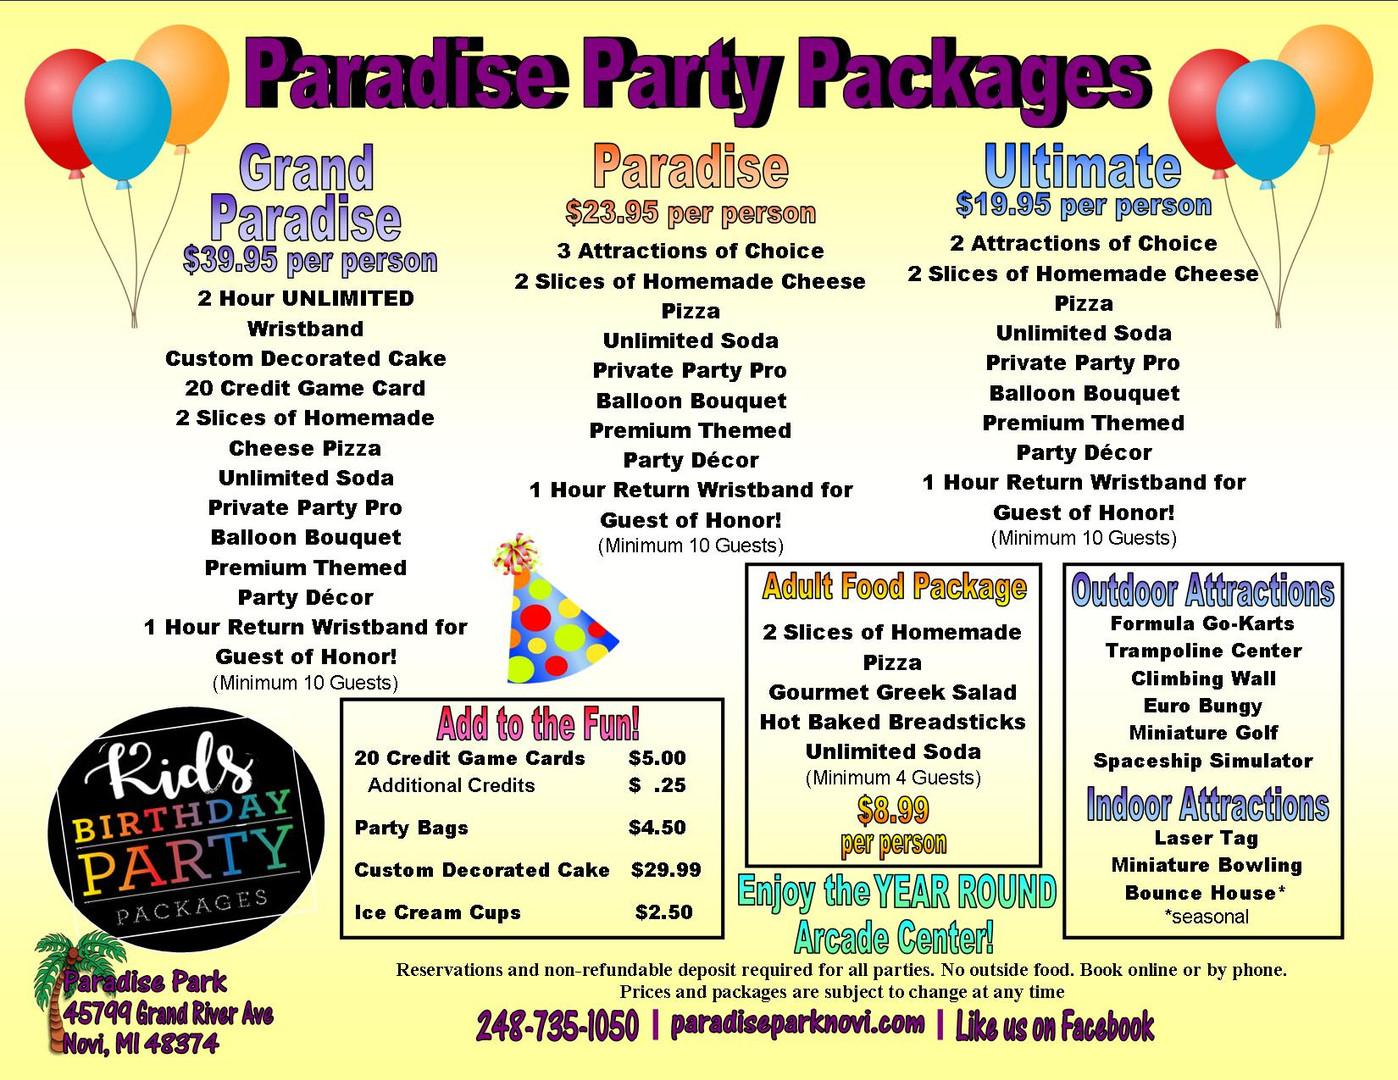 Paradise Park Party Packages